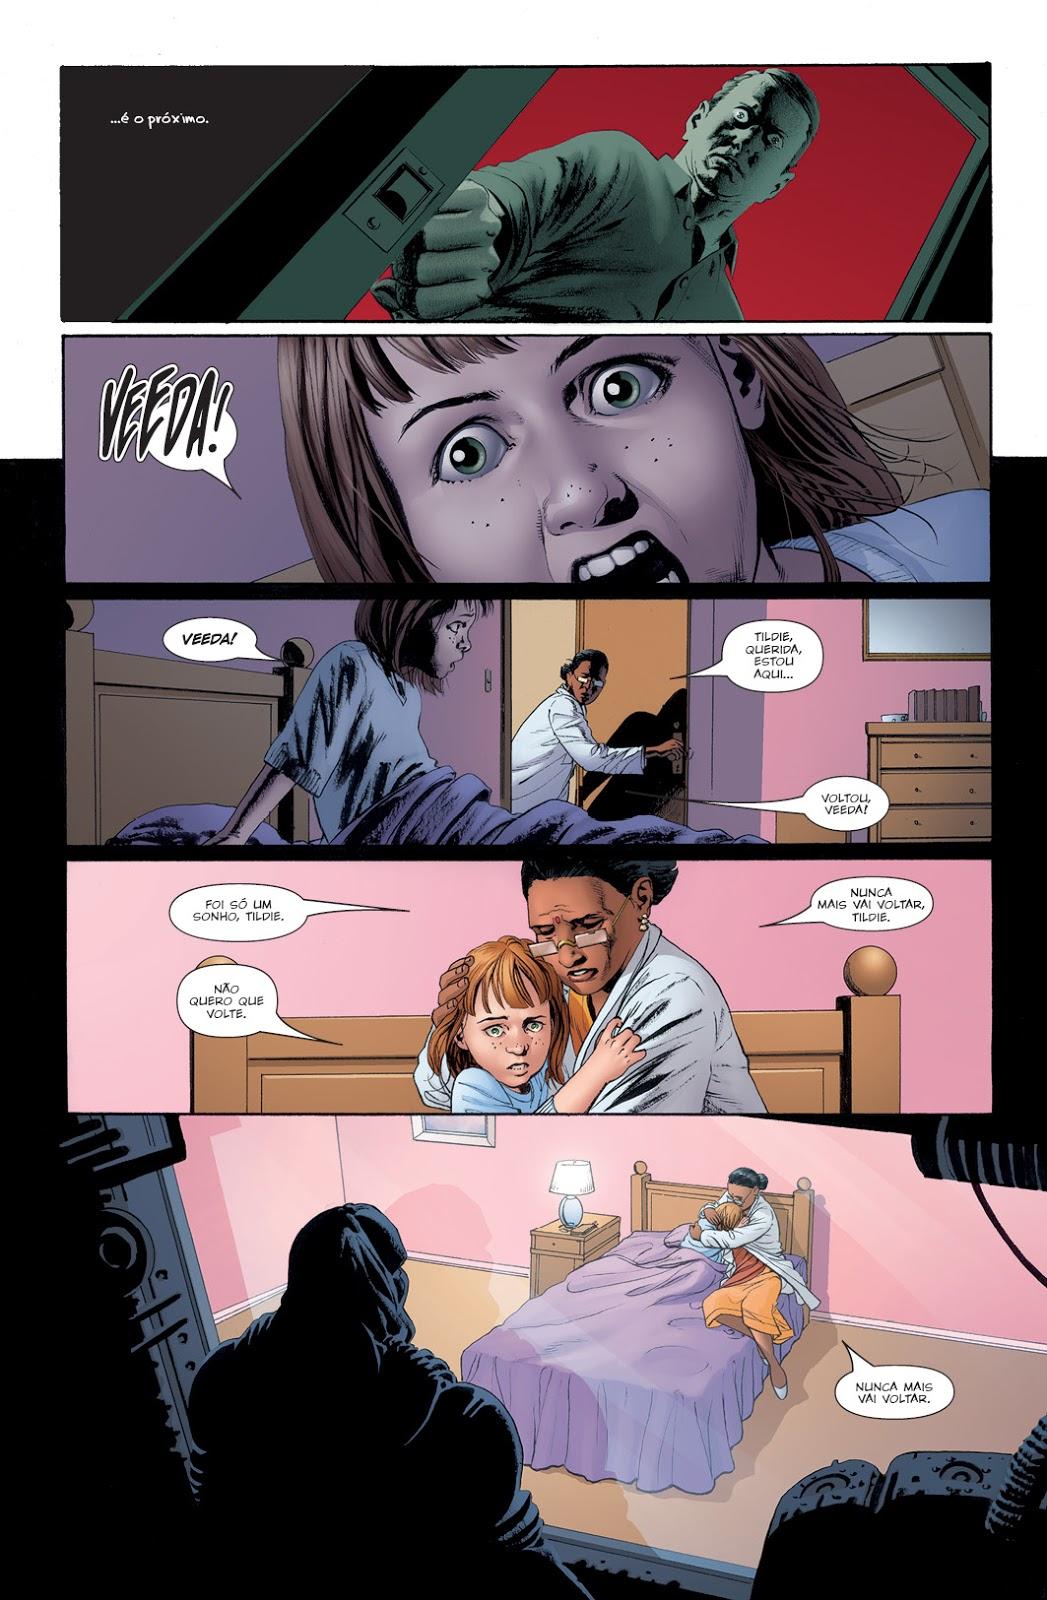 Astonishing X-Men, Livro Um, Deus Me Livro, G. Floy, Joss Whedon, John Cassaday